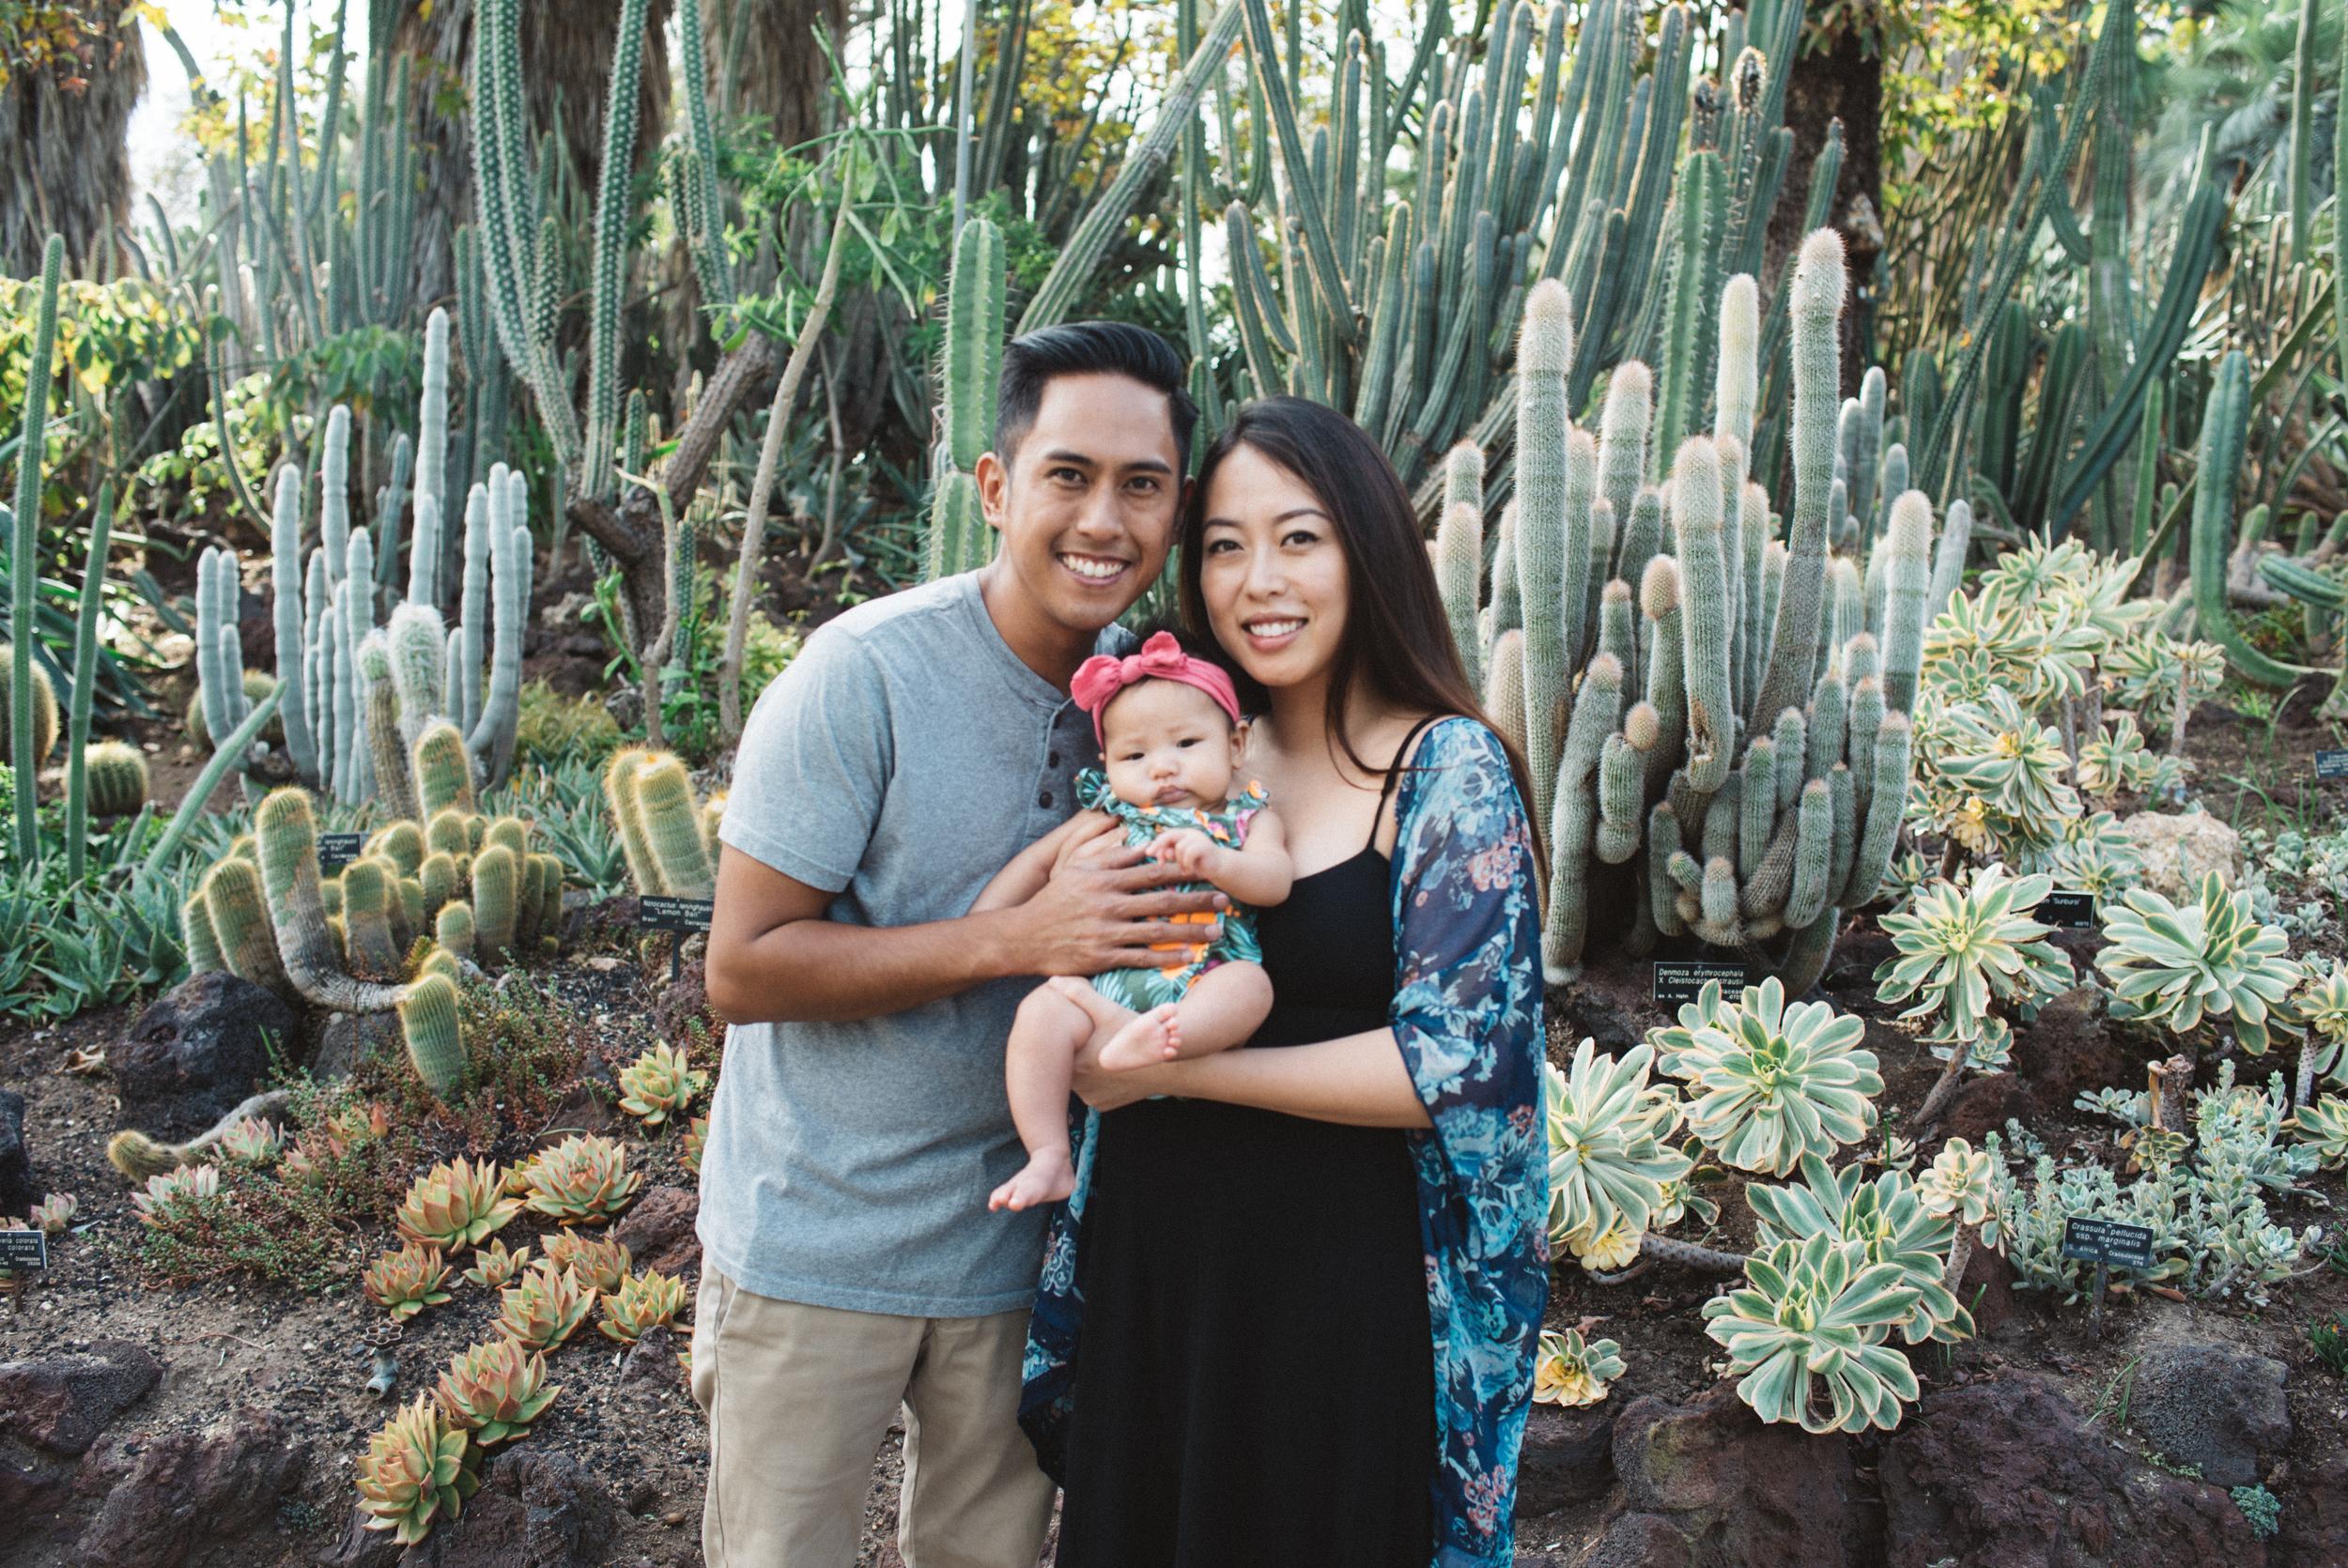 Family photo at Huntington Library Botanical Gardens, San Marino, CA. Ava is 8 weeks here.